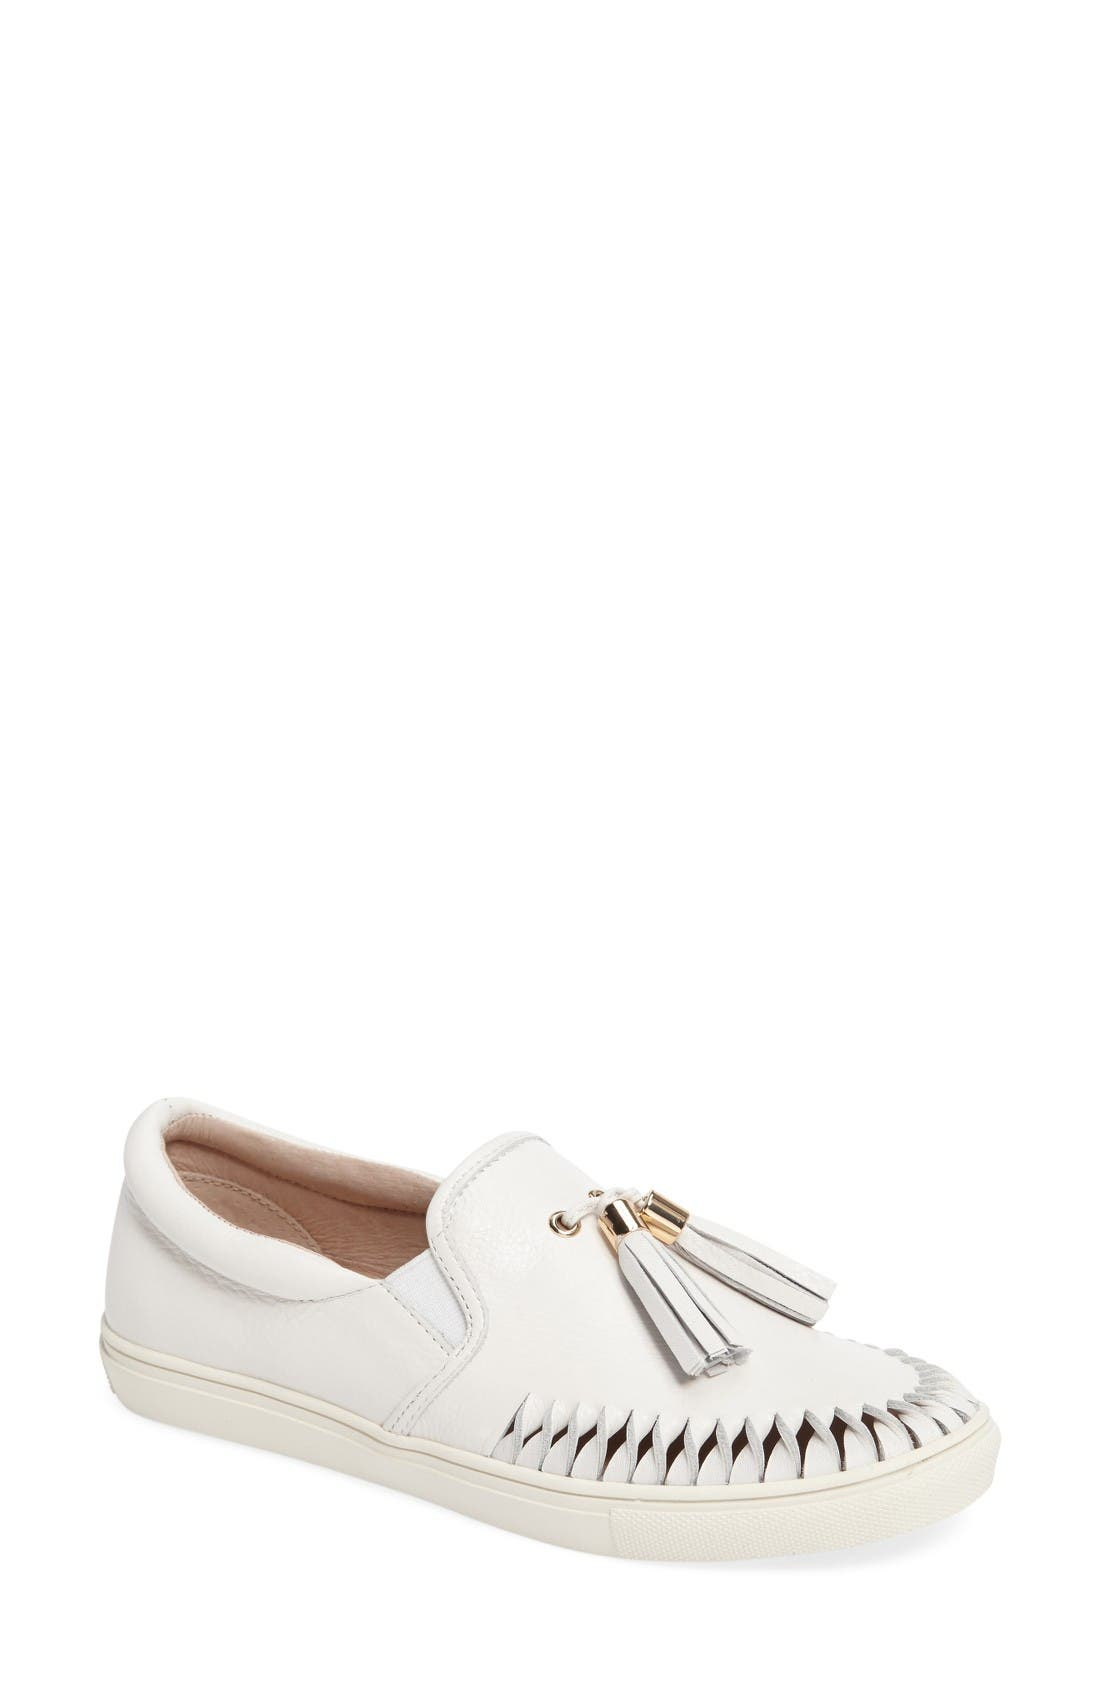 JSlides Cheyenne Tasseled Slip-On Sneaker (Women)